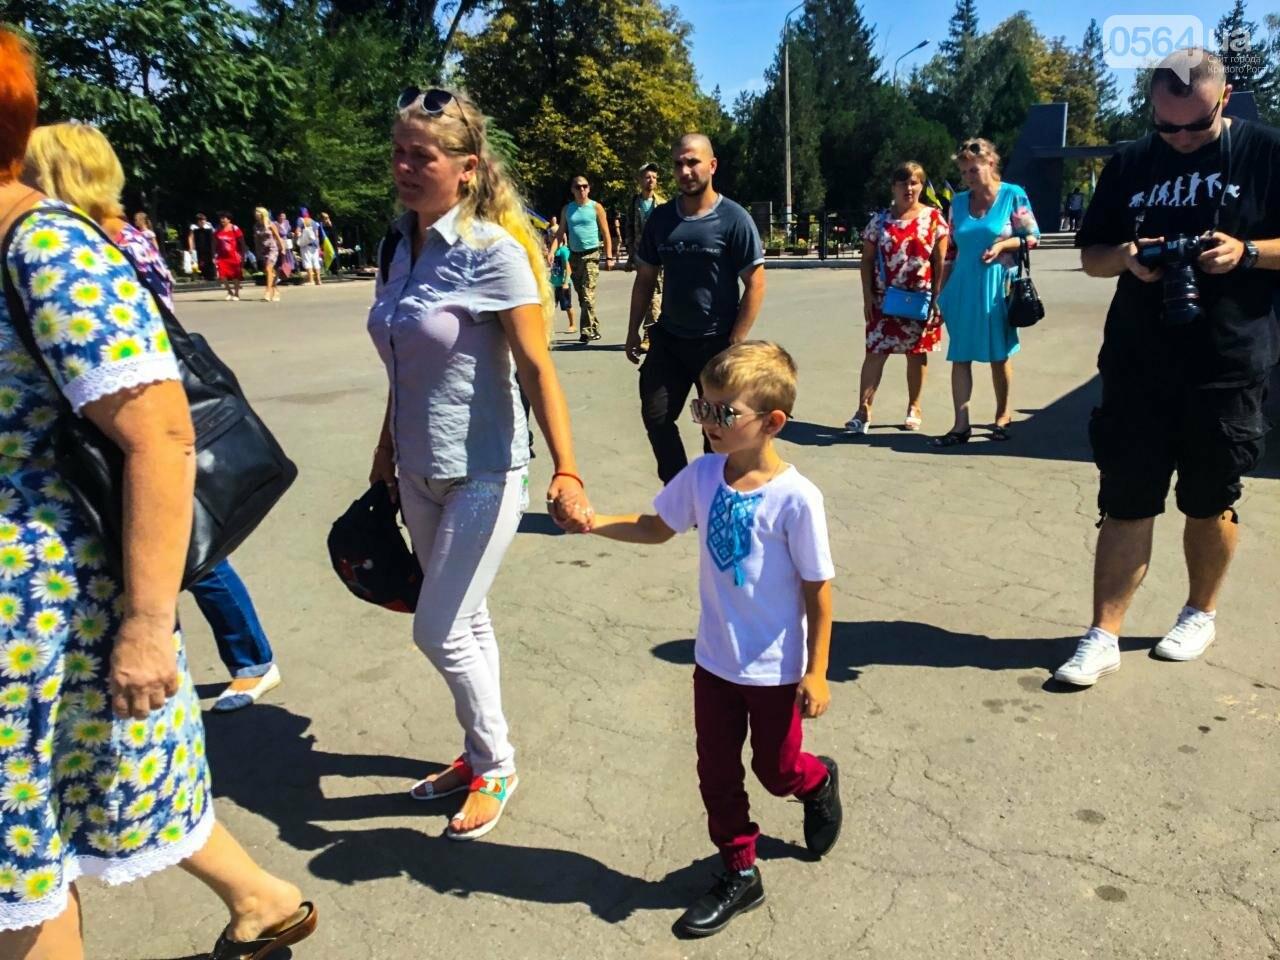 На Аллее Героев провели панихиду по погибшим в зоне АТО криворожанам, - ФОТО , фото-8